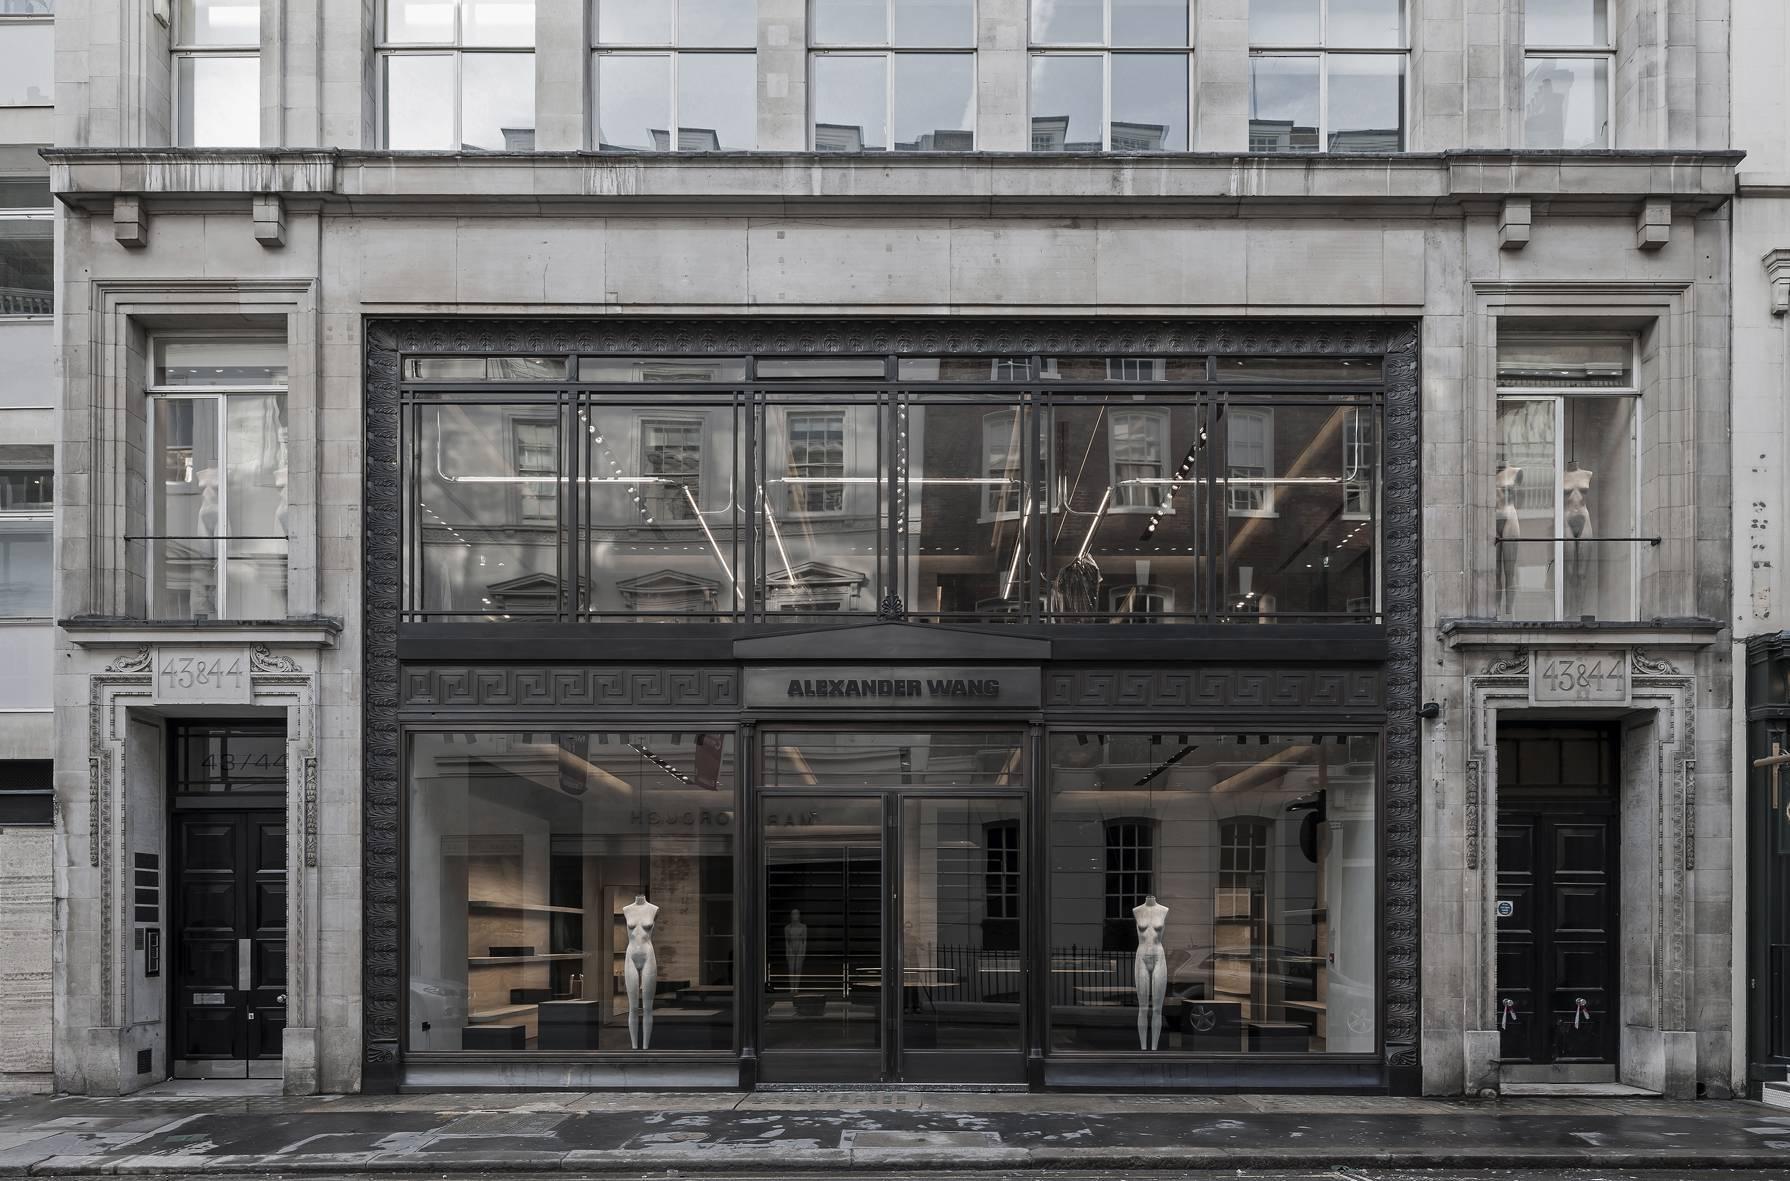 Alexander Wang Flagship Store_Vincent Van Duysen Architects_01.jpg